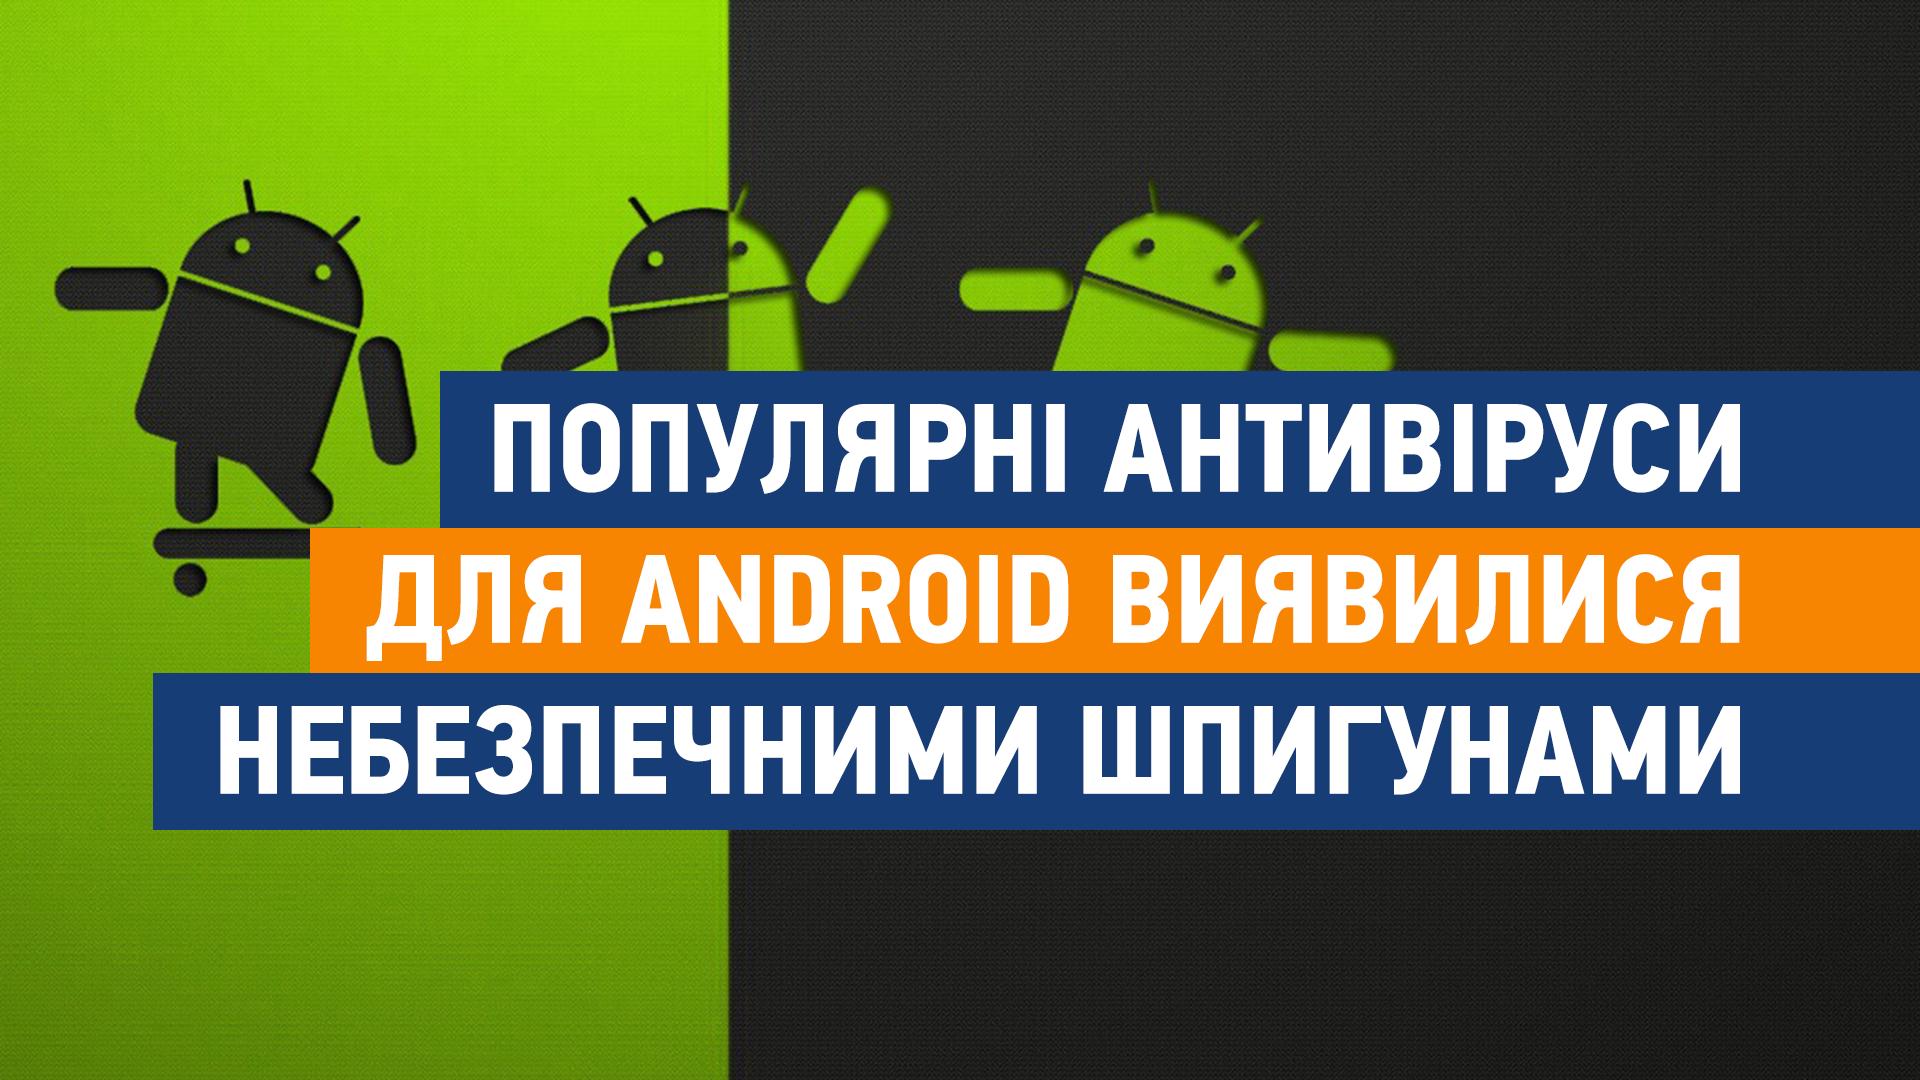 Популярні антивіруси для Android виявилися небезпечними шпигунами - додаток, google, android - android poglyad